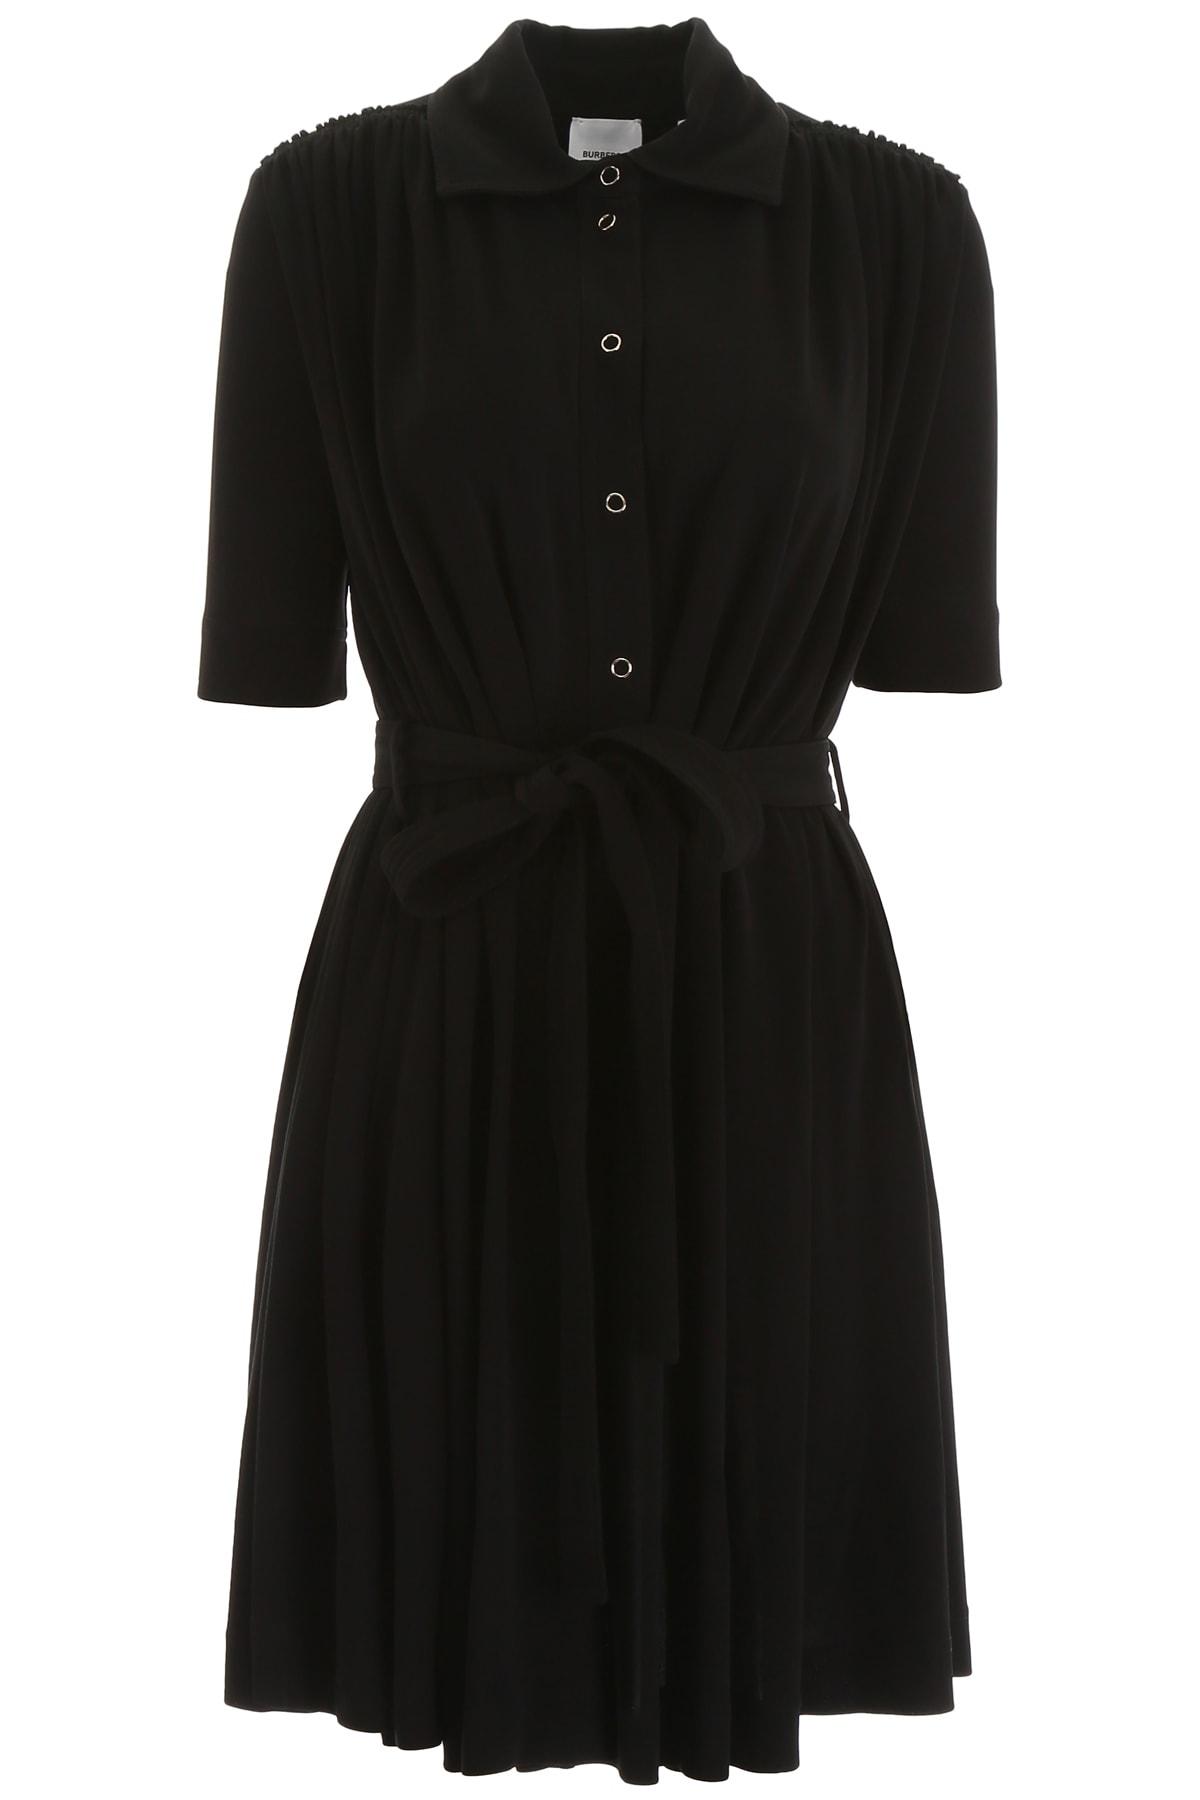 Burberry Cammie Dress